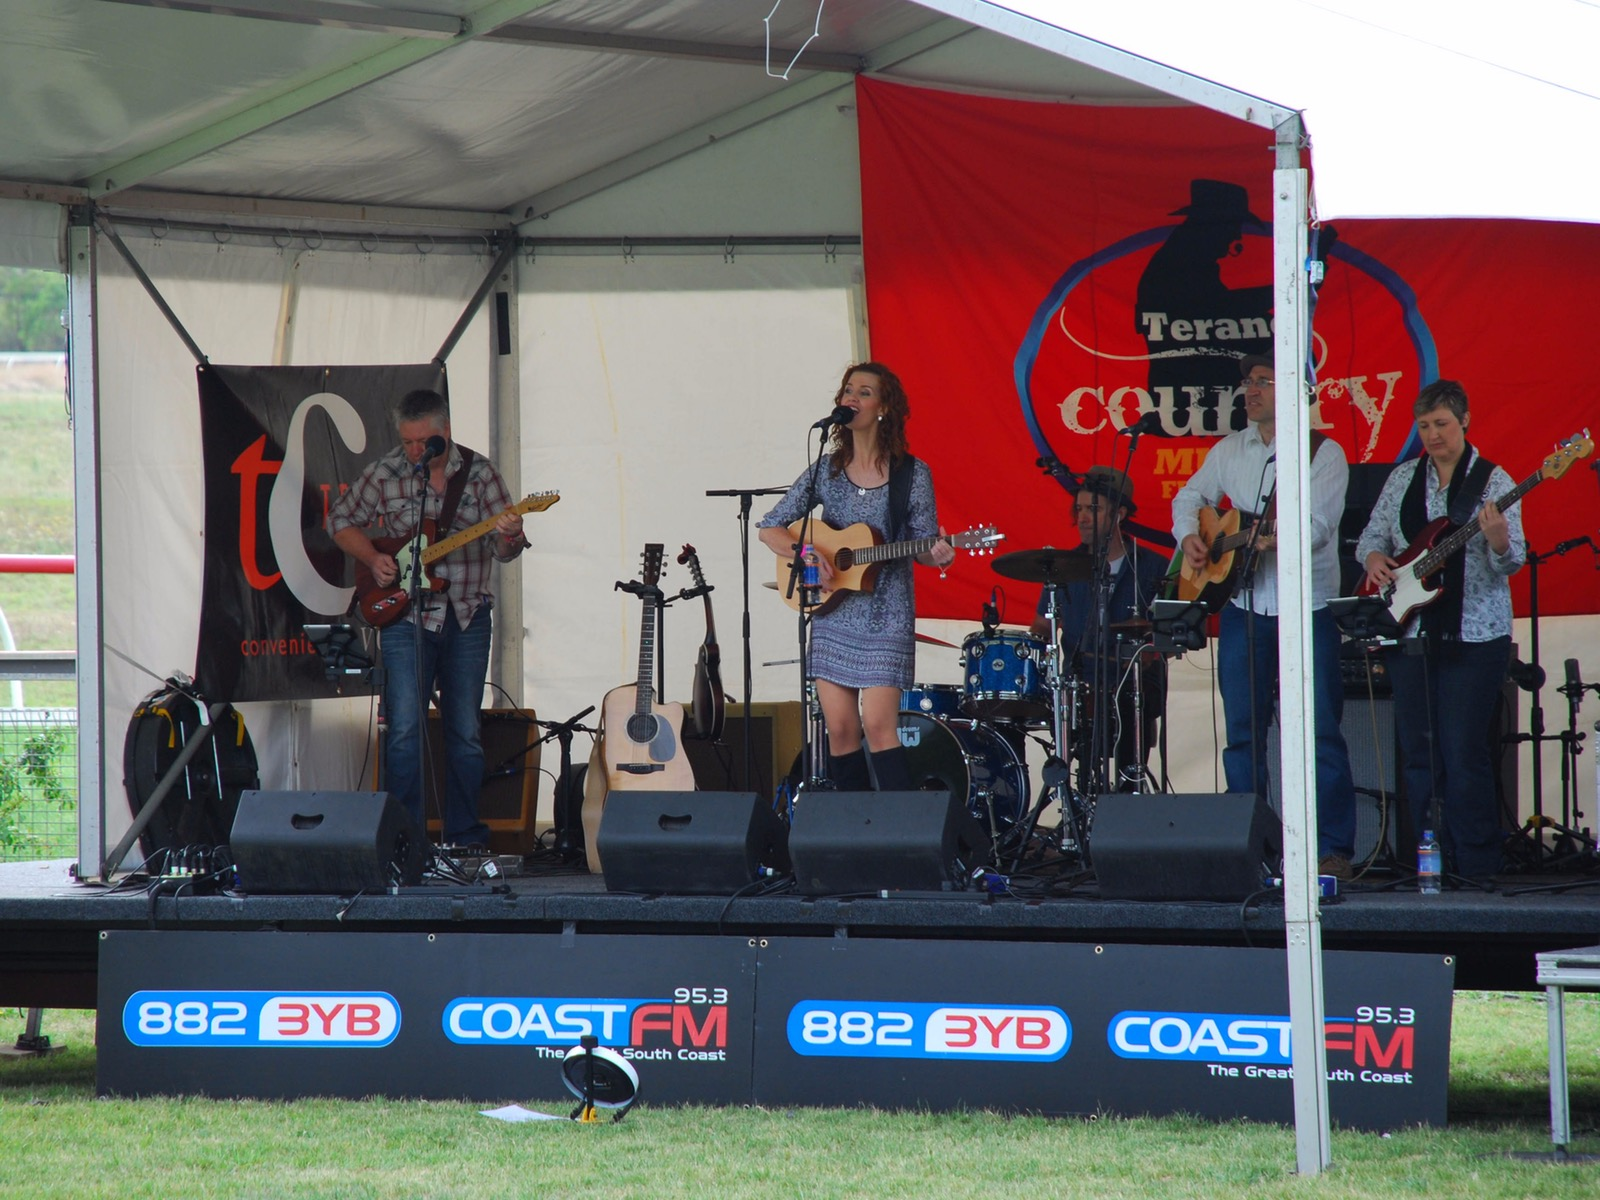 Terang Country Music Festival